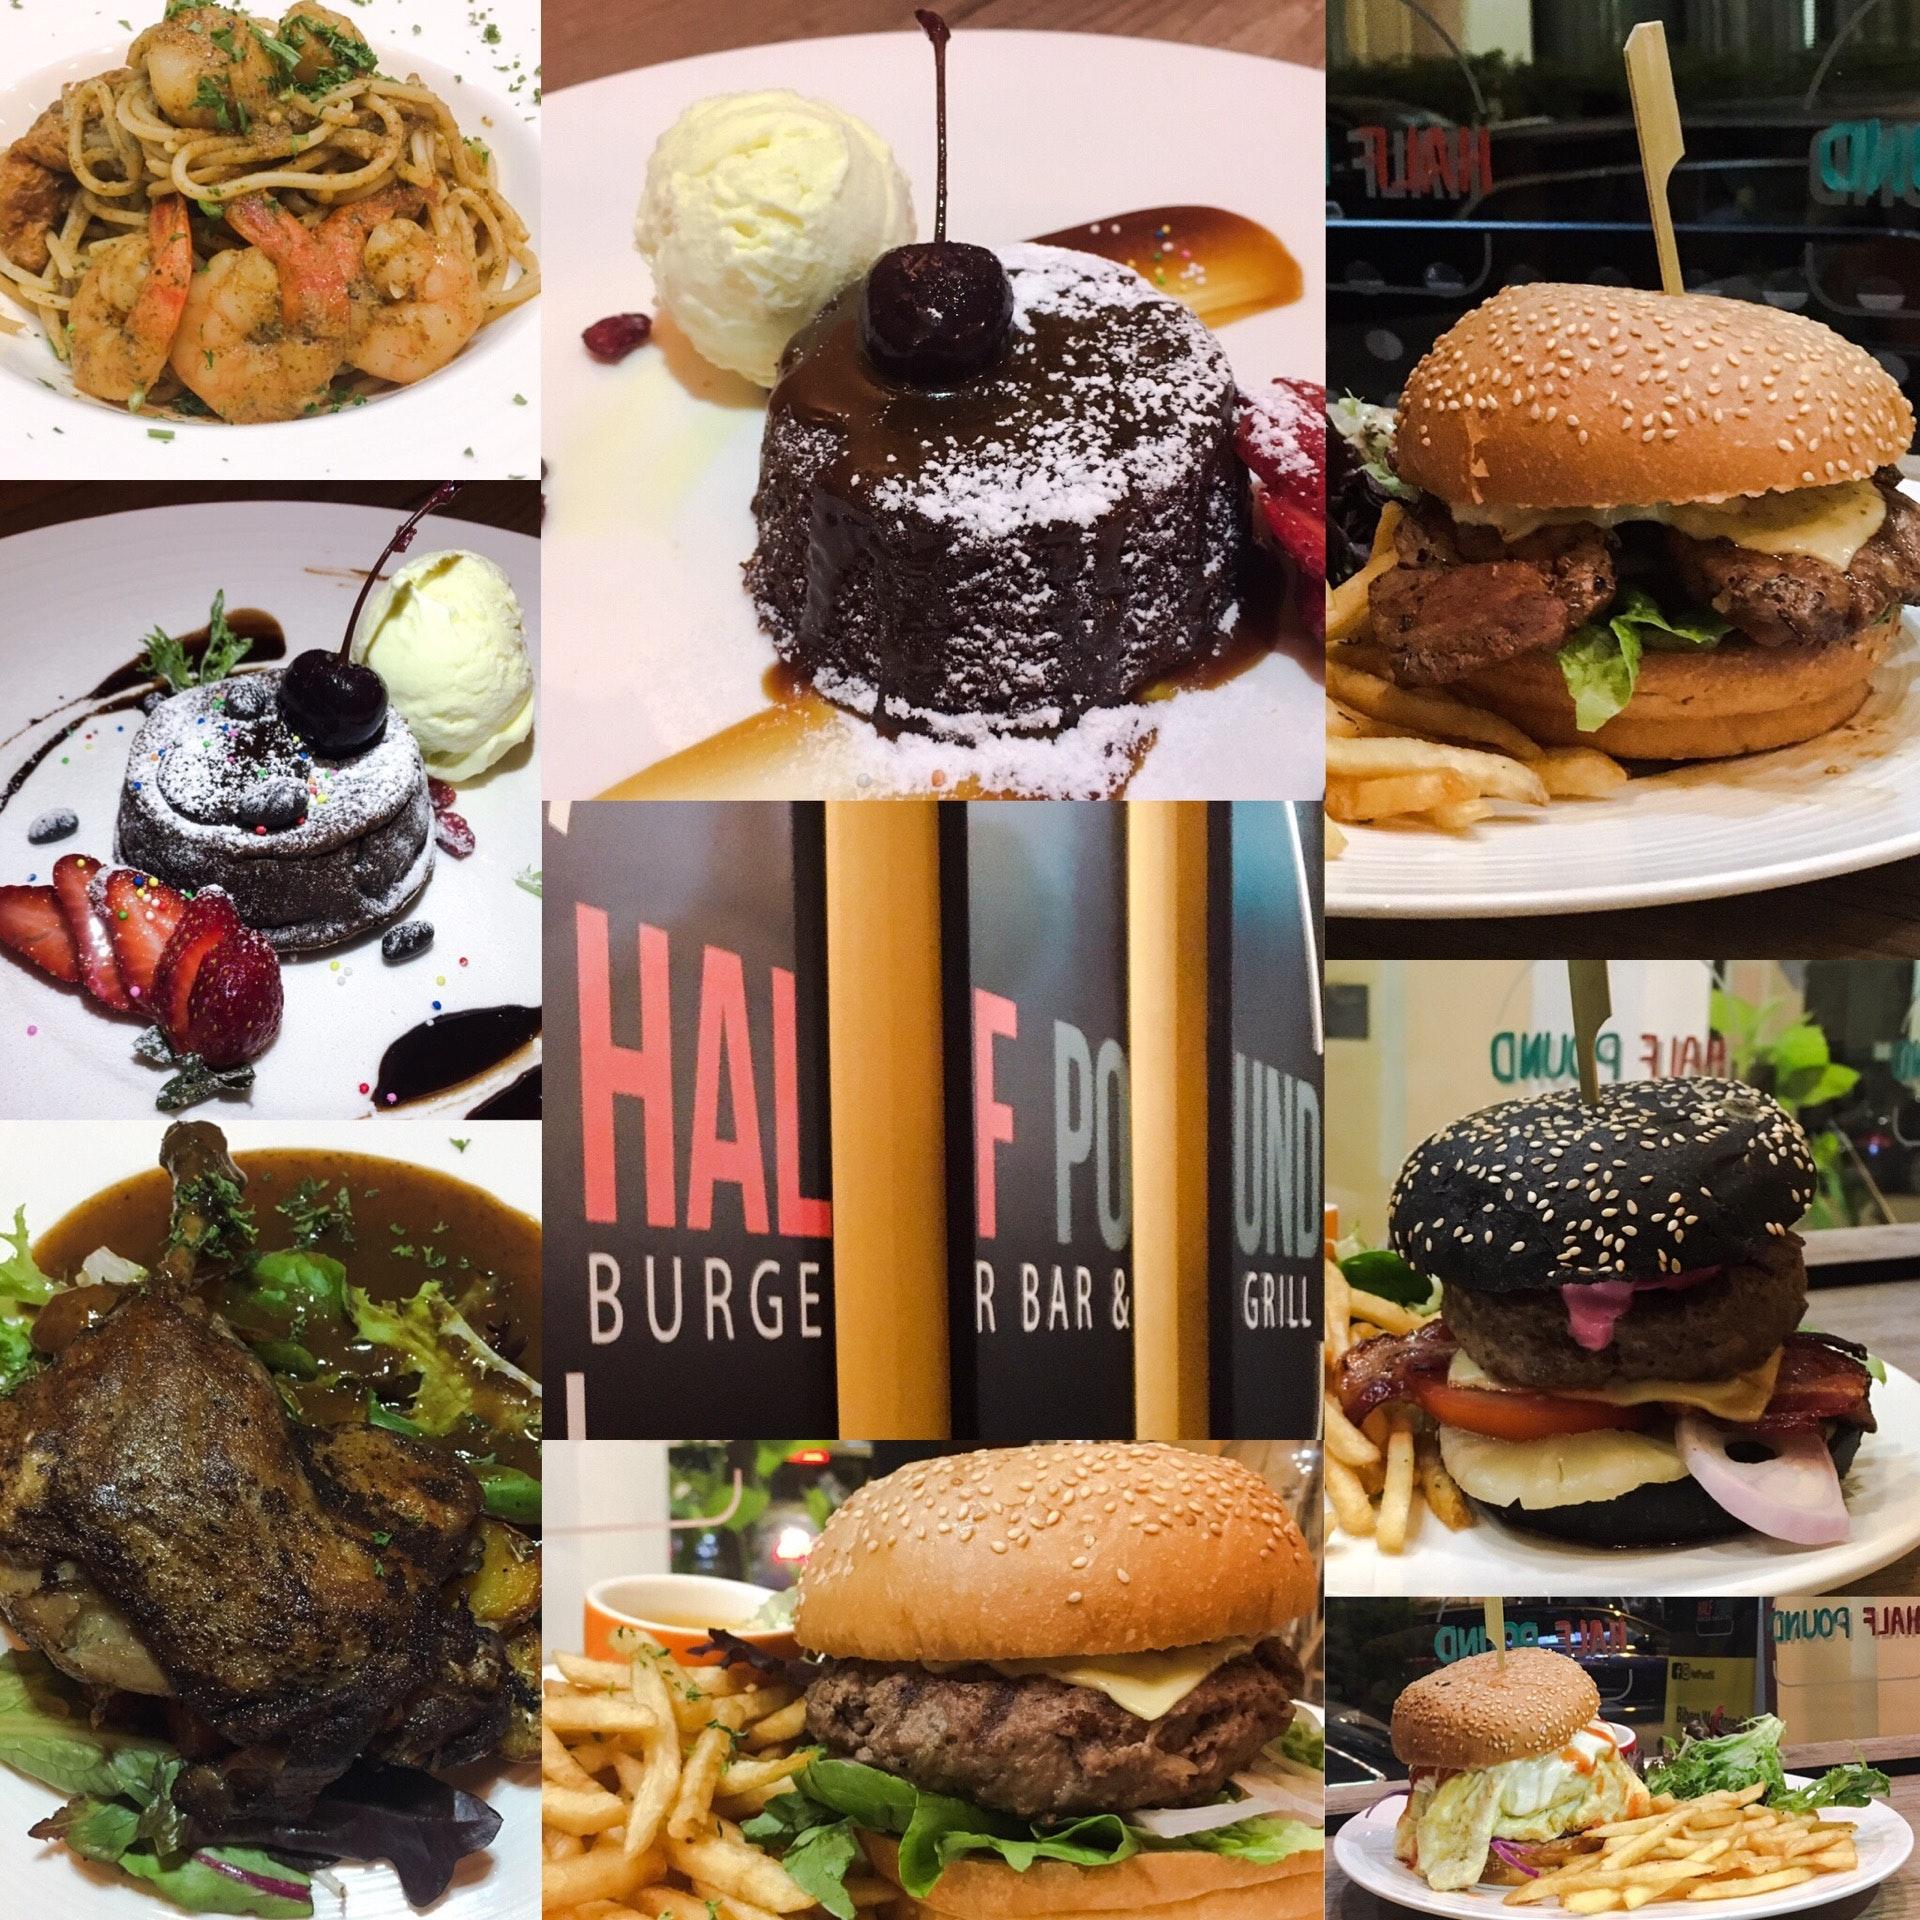 Burpple Tastemaker Eatup at Half Pound Burger Bar & Grill